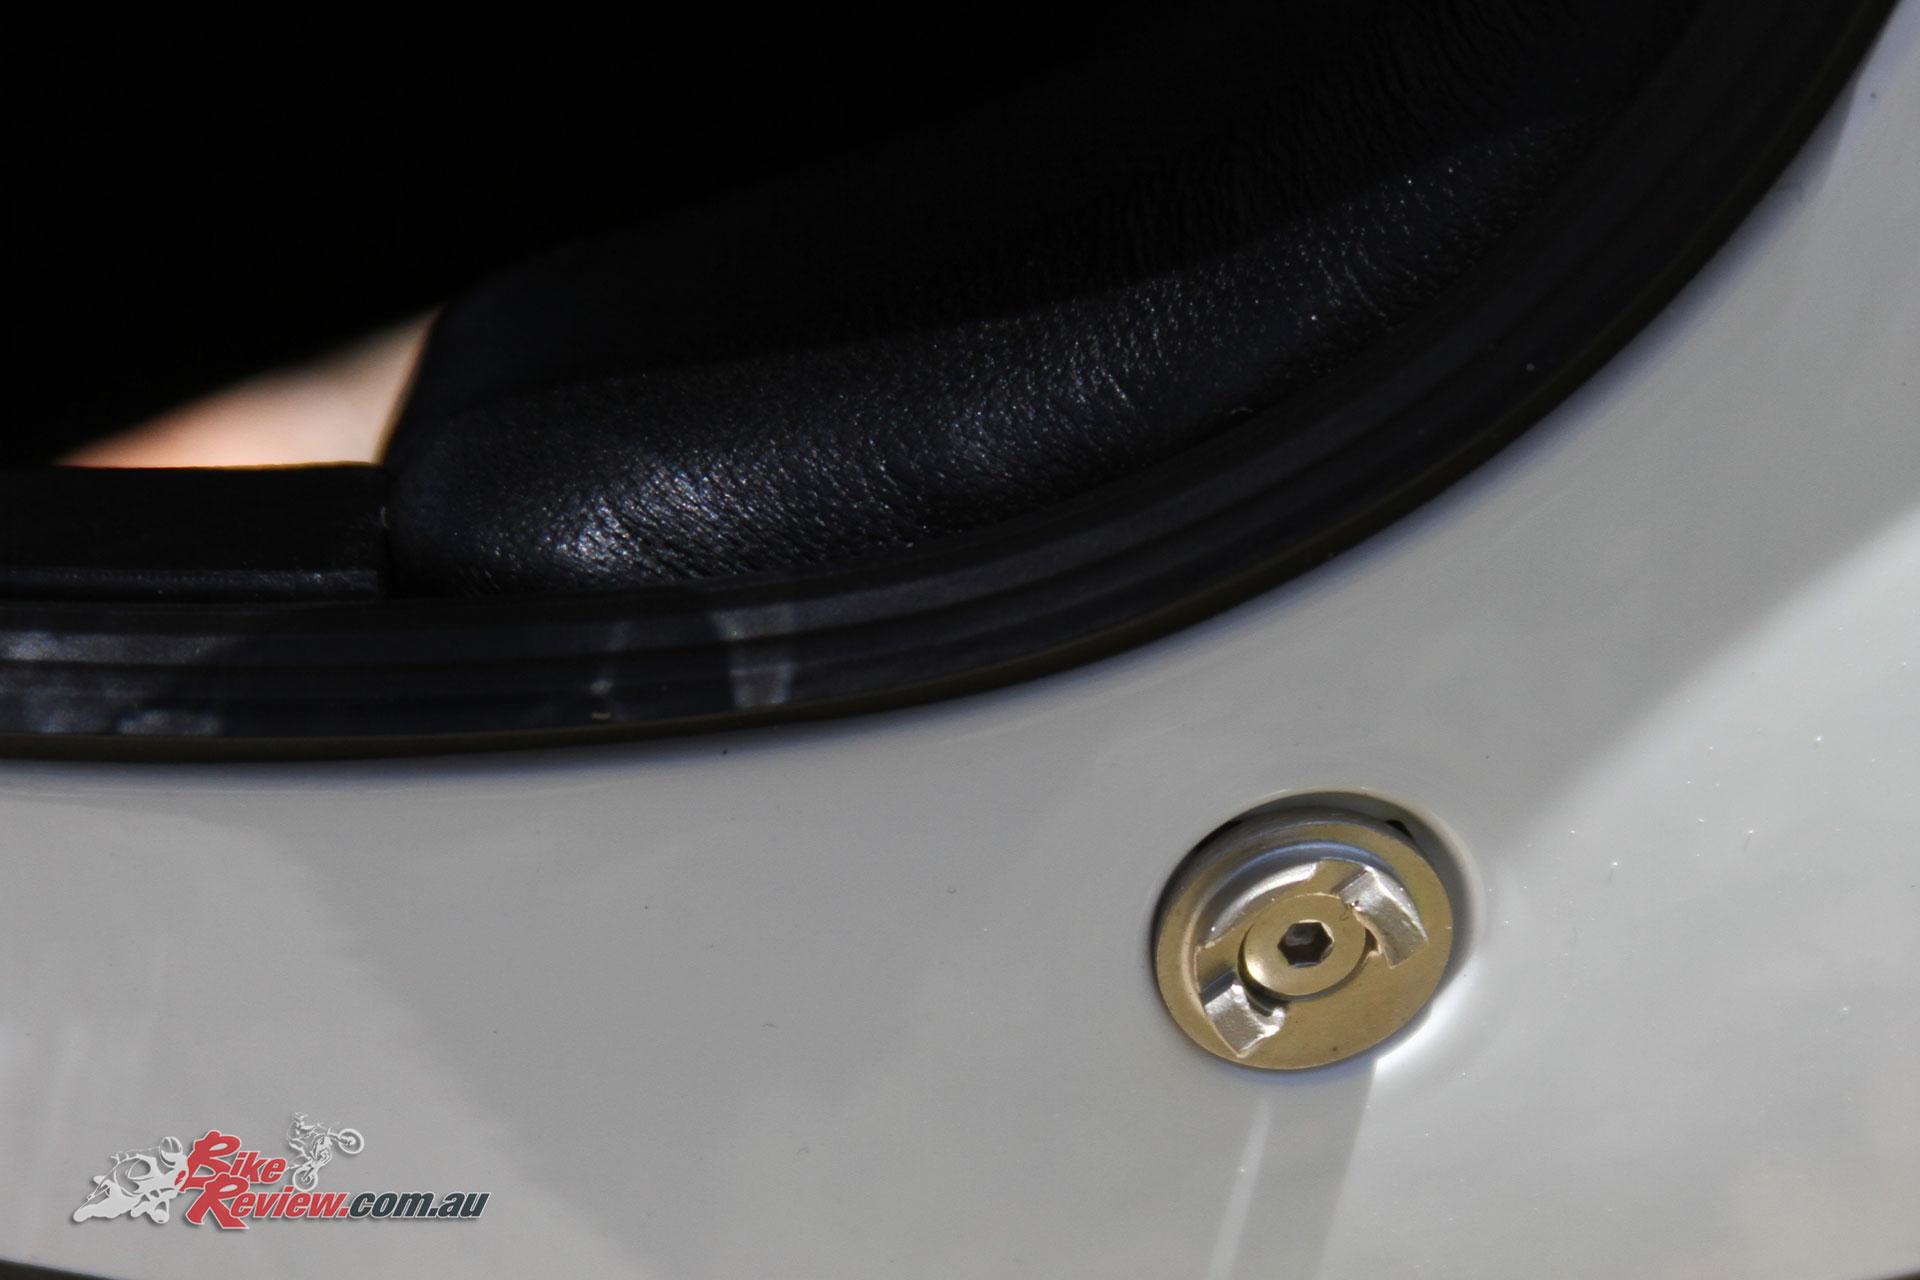 AGV X3000 HELMET - GLORIA | Helmet, Bike exif, Red